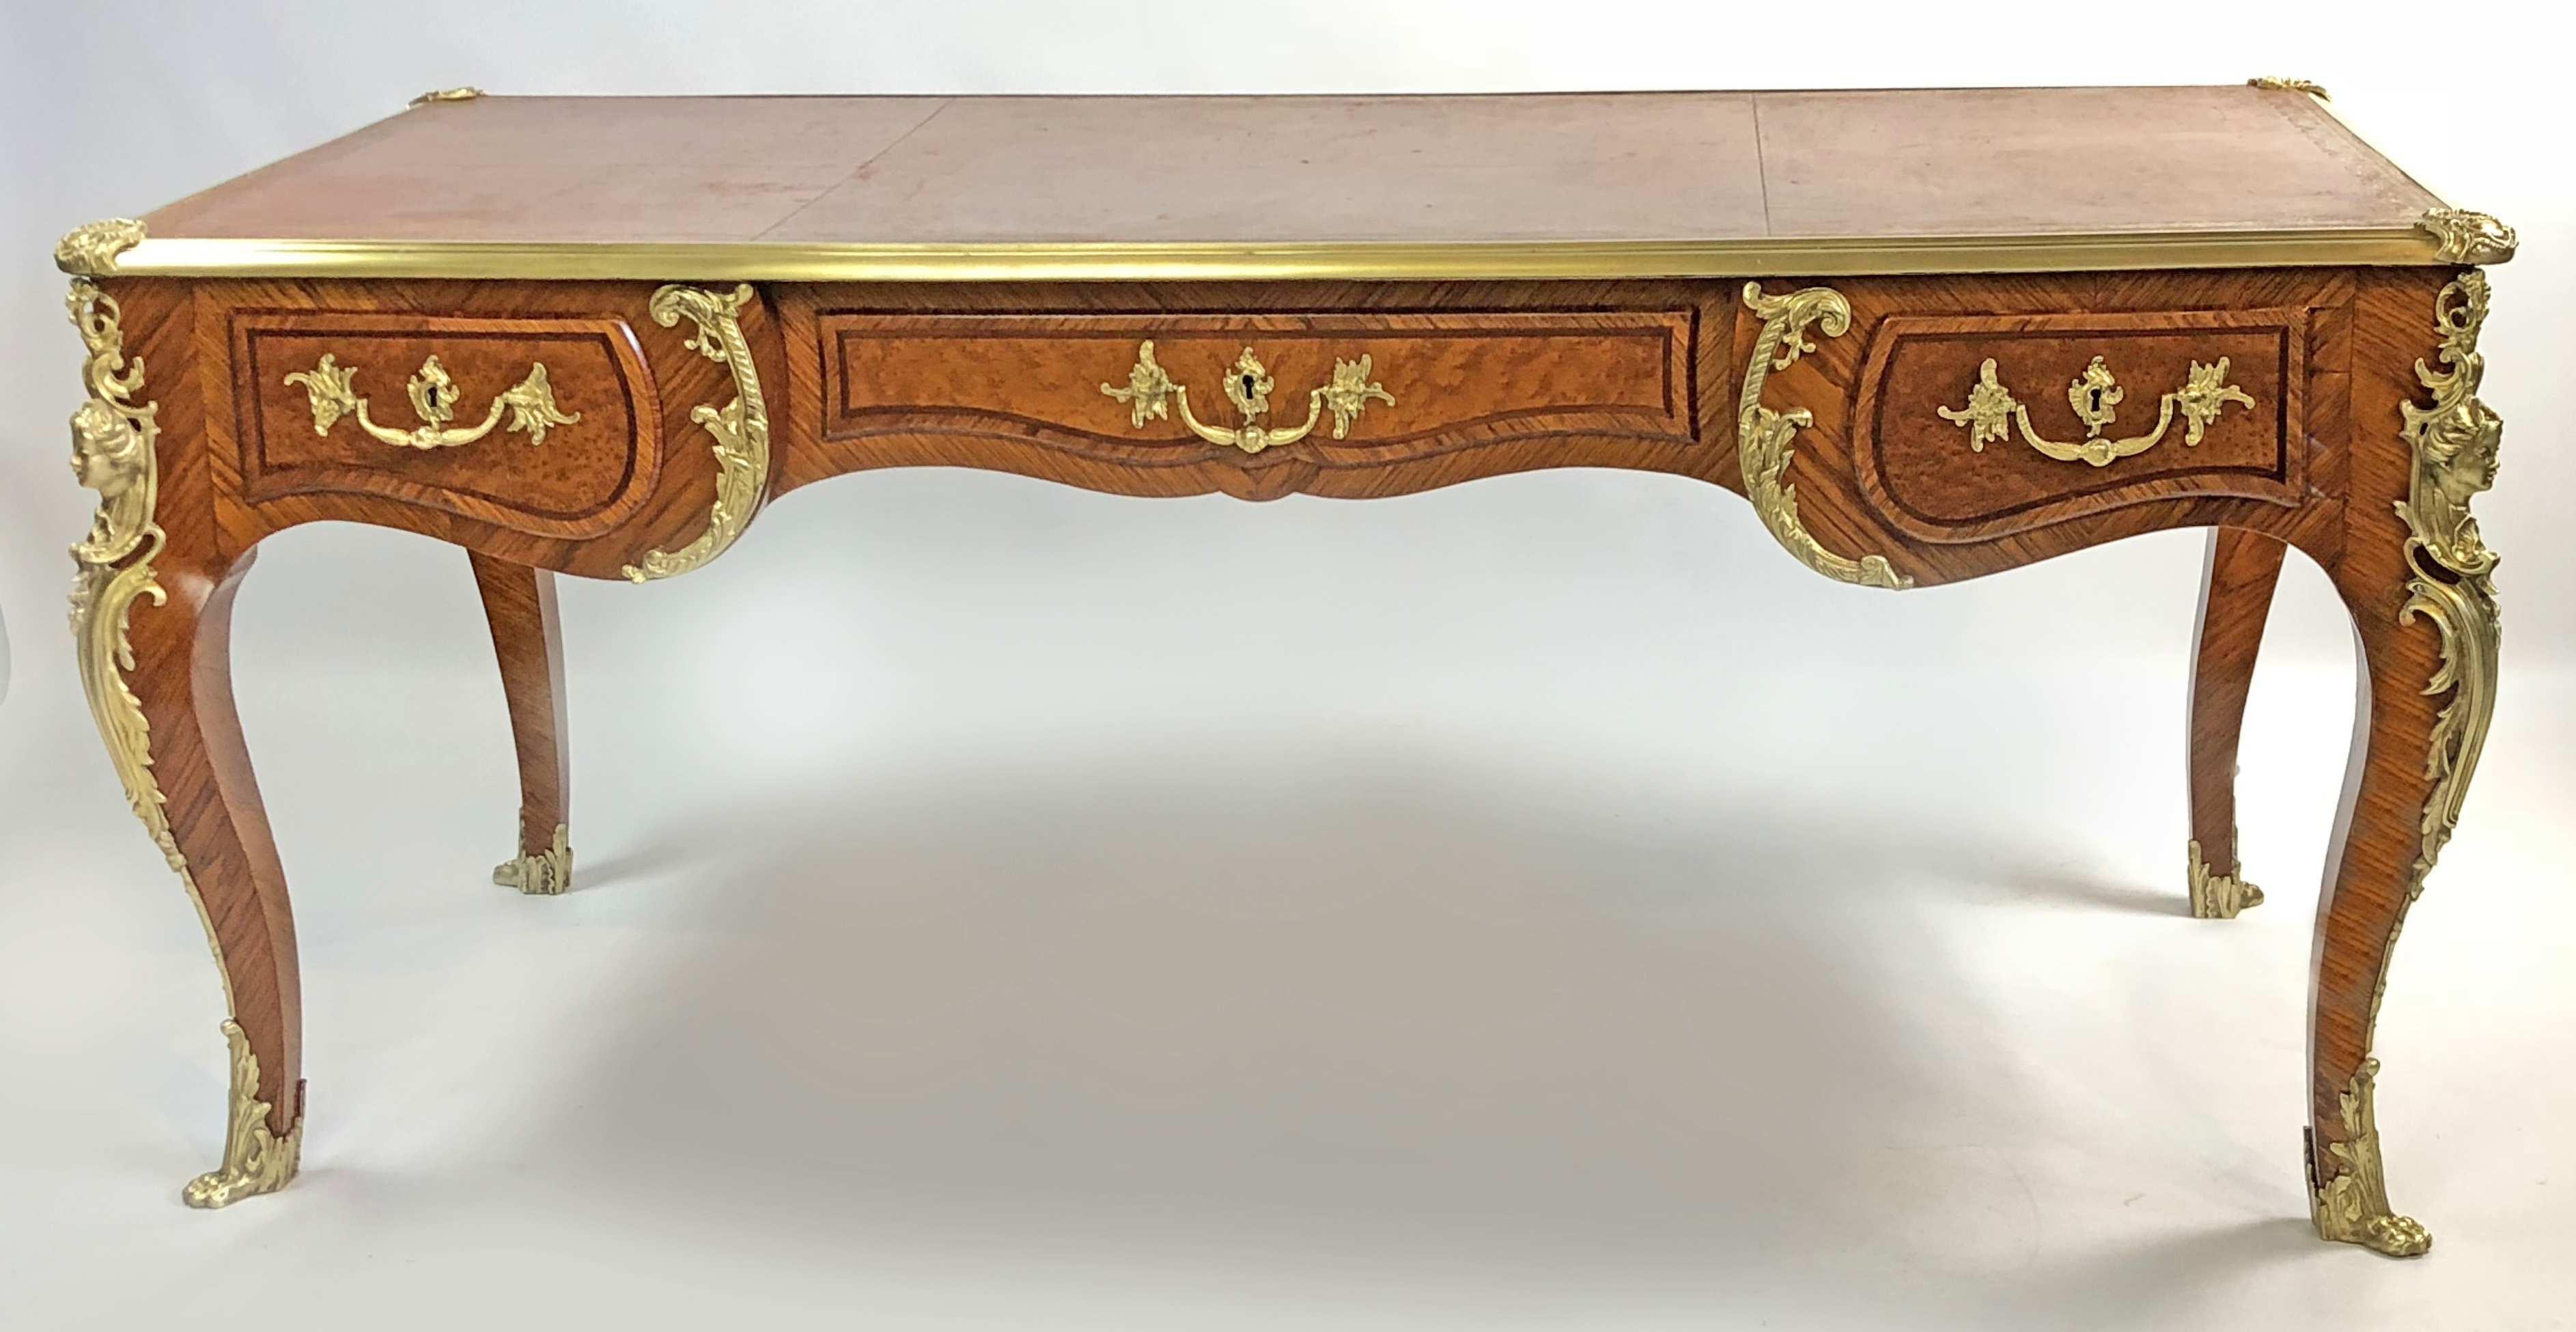 French style louis xv style bureau plat desk